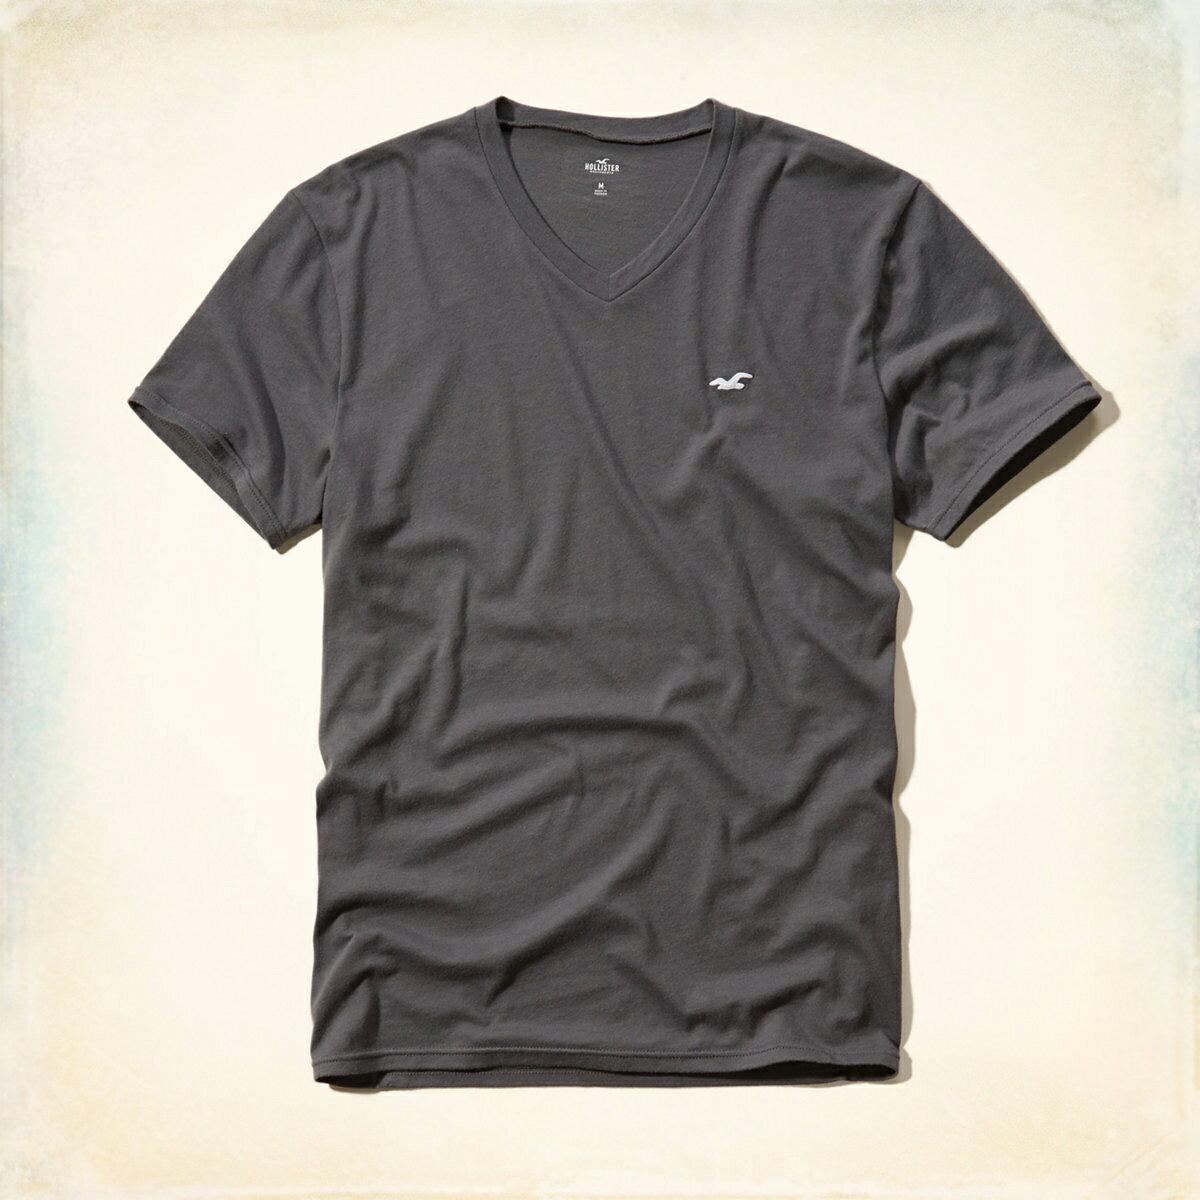 美國百分百【Hollister Co.】T恤 HCO 短袖 T-shirt 海鷗 深灰色 素T logo V領 S號 E956